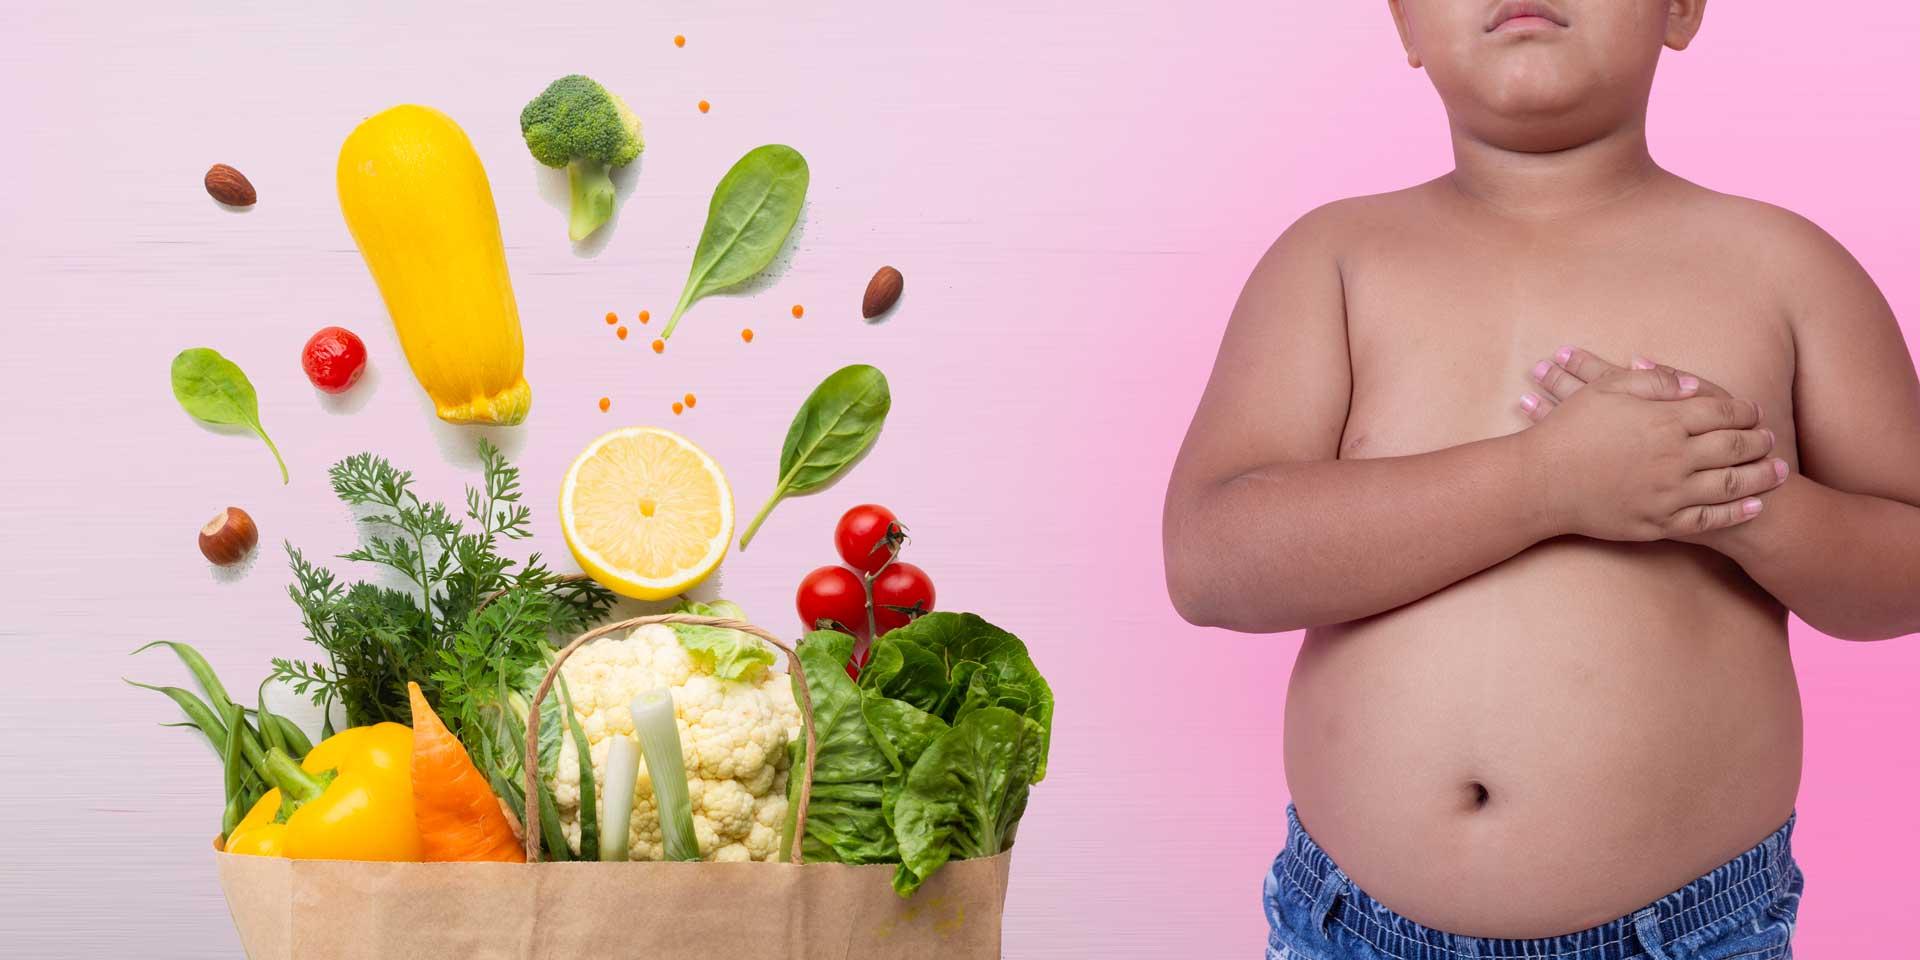 Здравословна храна и дете с наднормено тегло